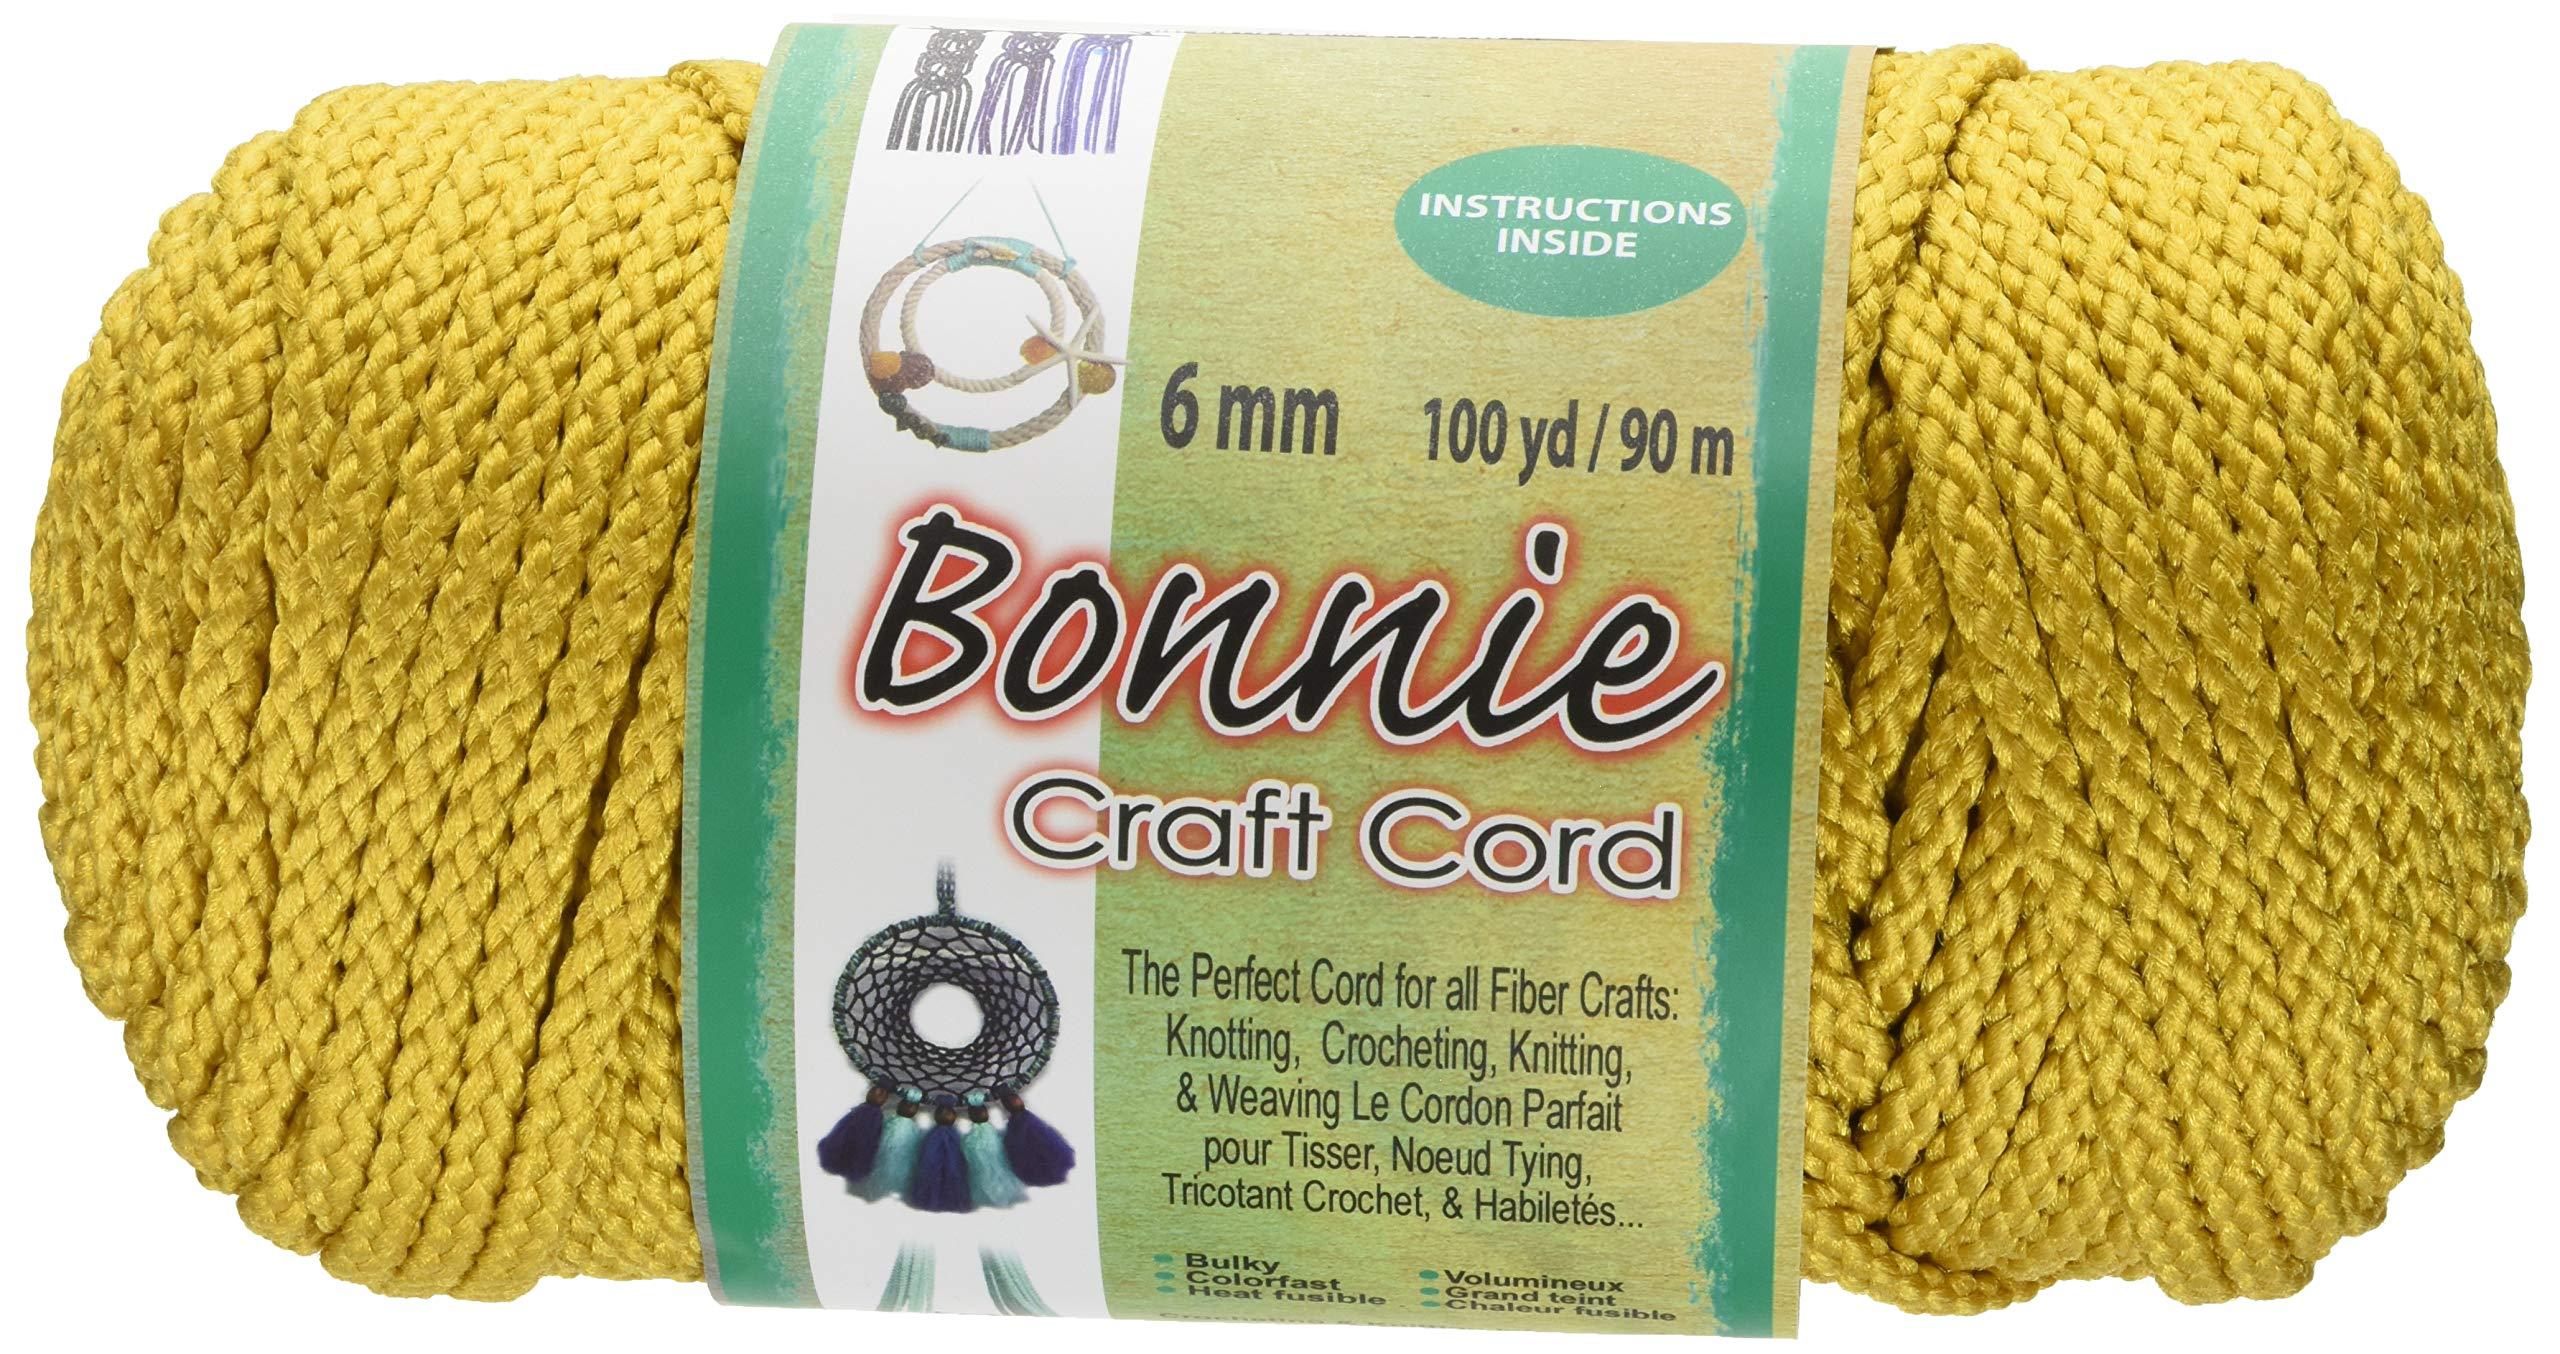 Pepperell 6mm Bonnie Macramé Craft Cord, 100-Yard, Gold (BB6-100-026)